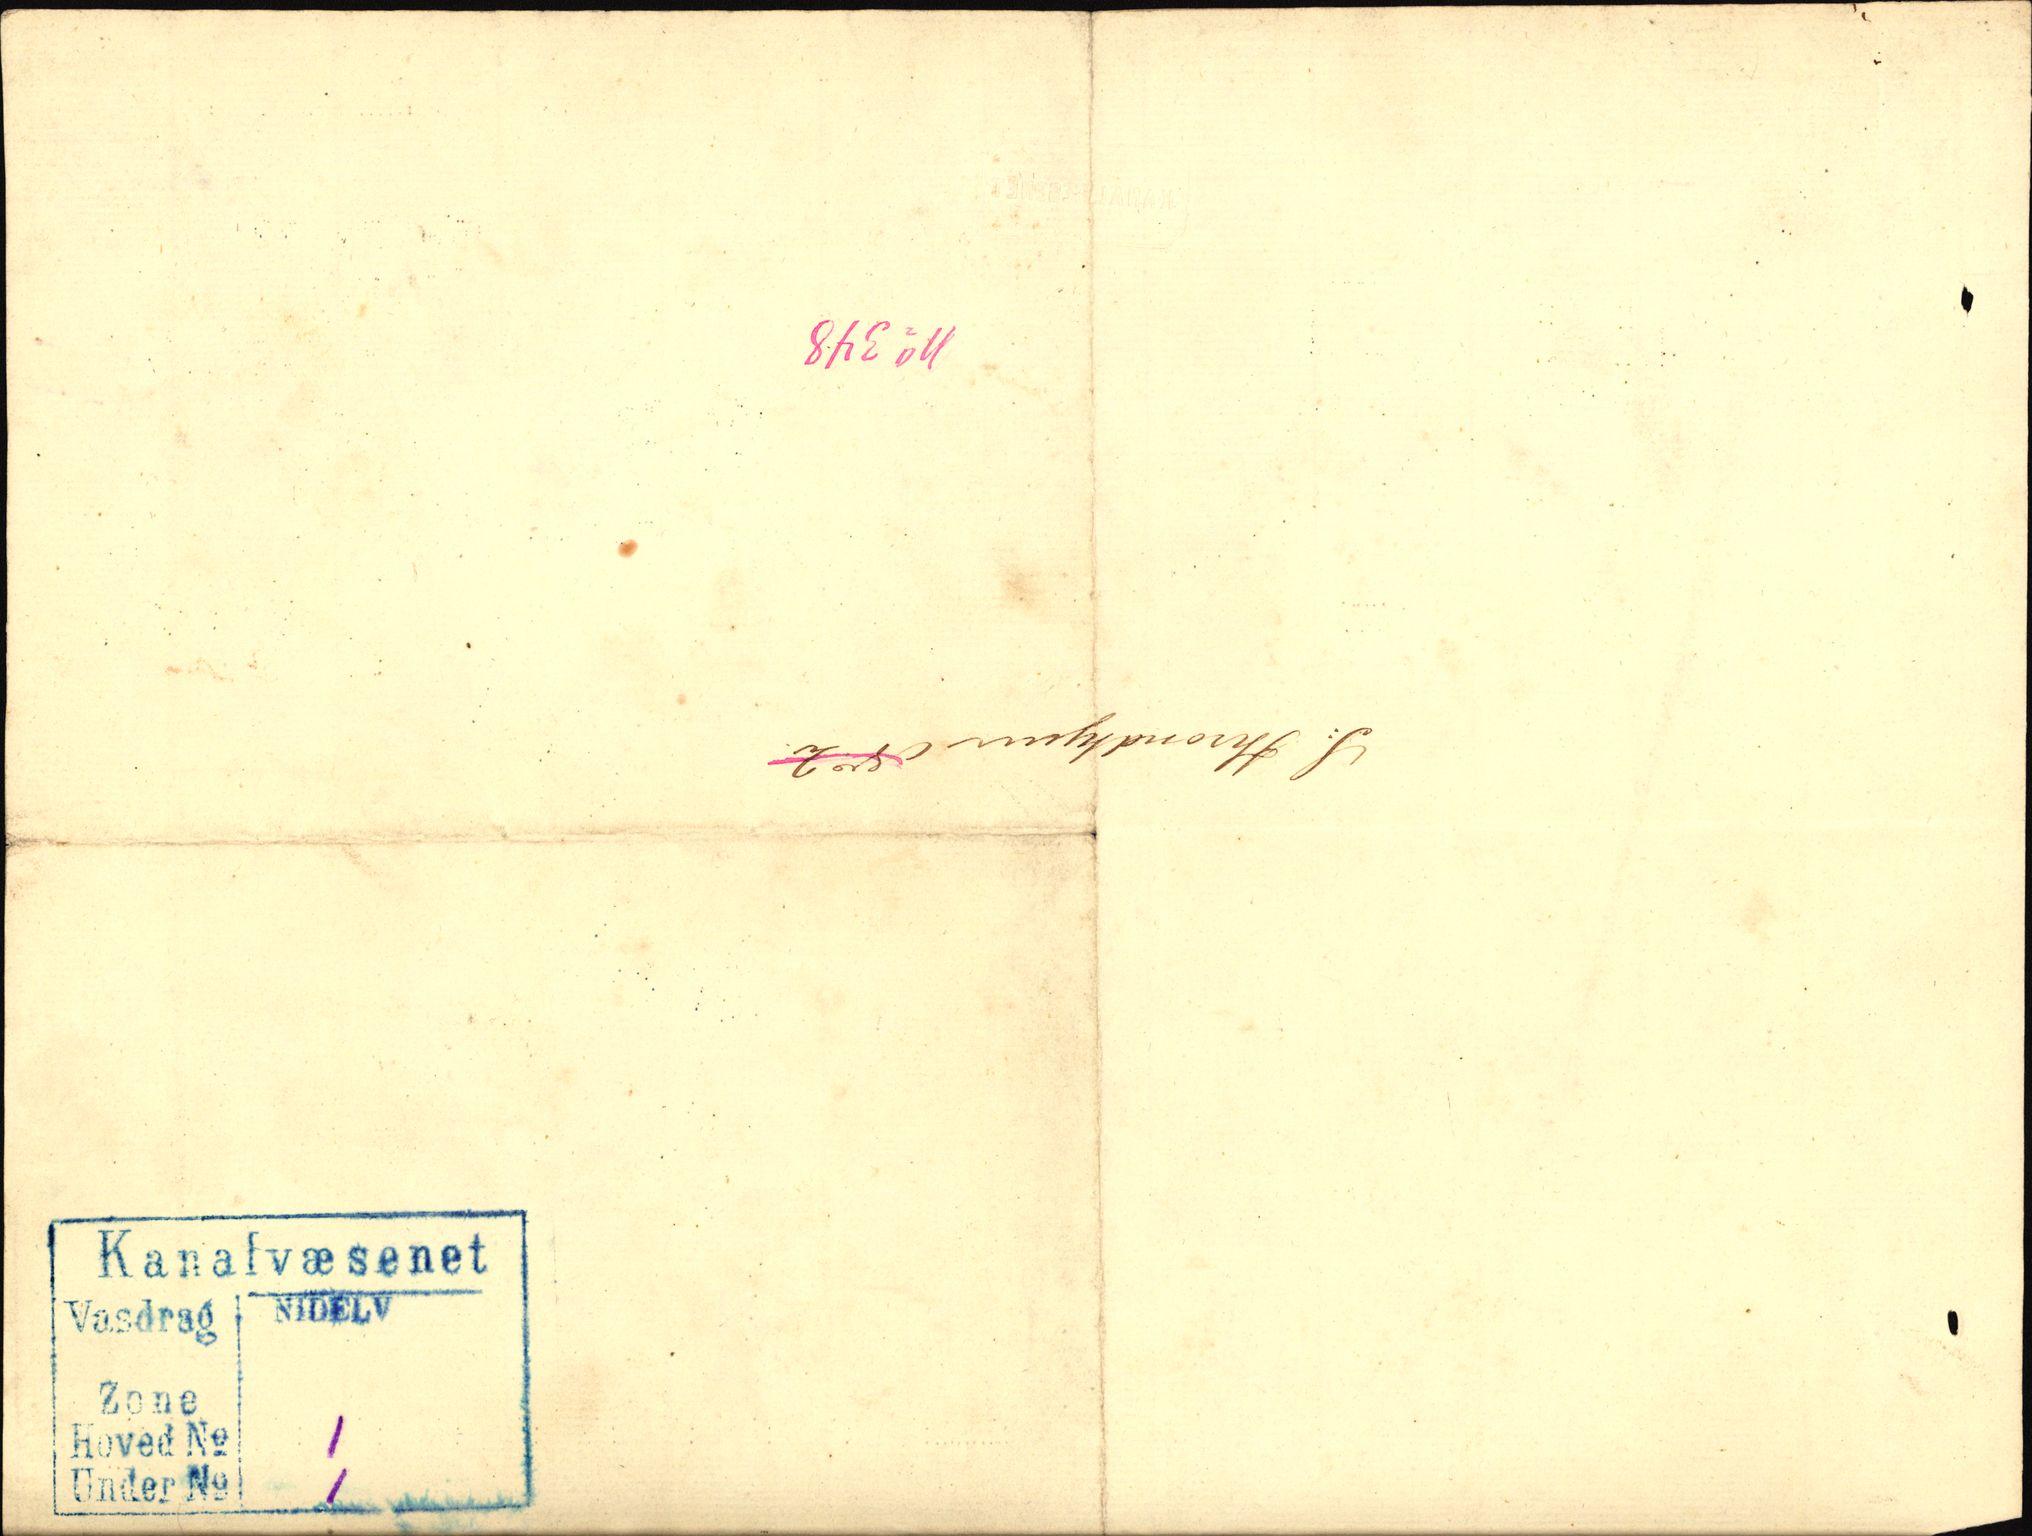 RA, Vassdragsdirektoratet/avdelingen, T/Ta/Ta59, 1850-1910, s. 1